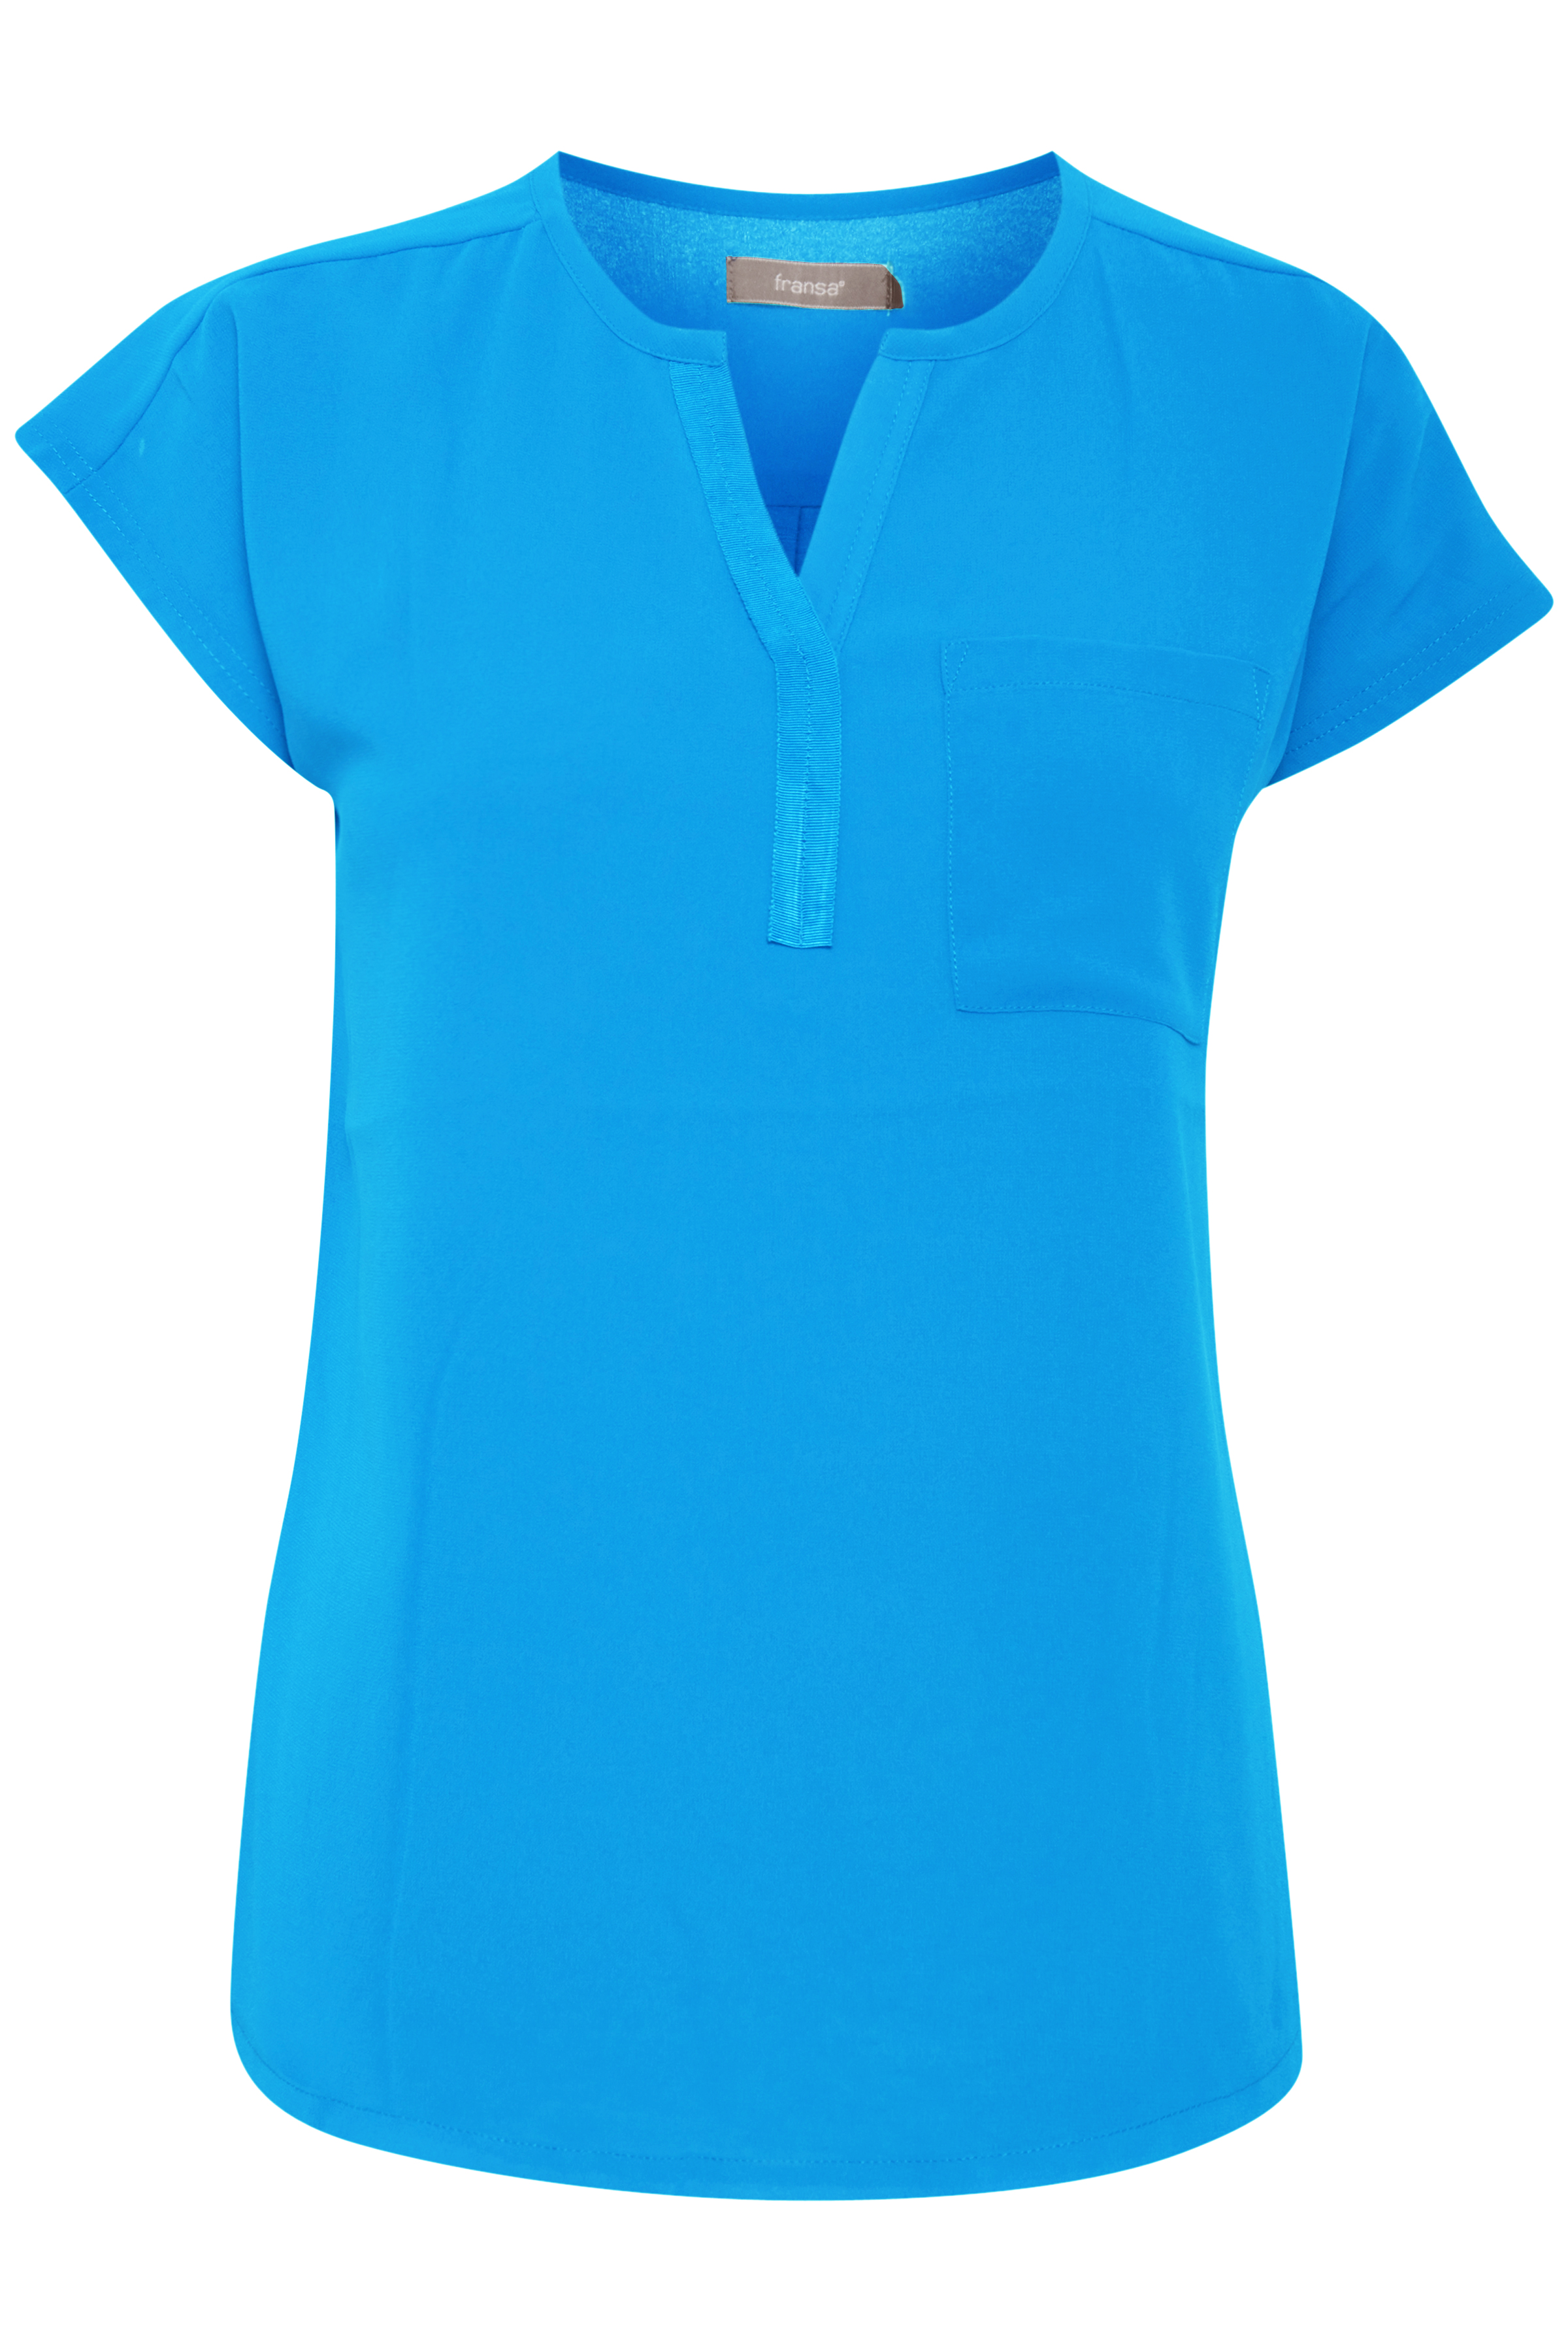 Marina Kortærmet bluse – Køb Marina Kortærmet bluse fra str. S-XXL her